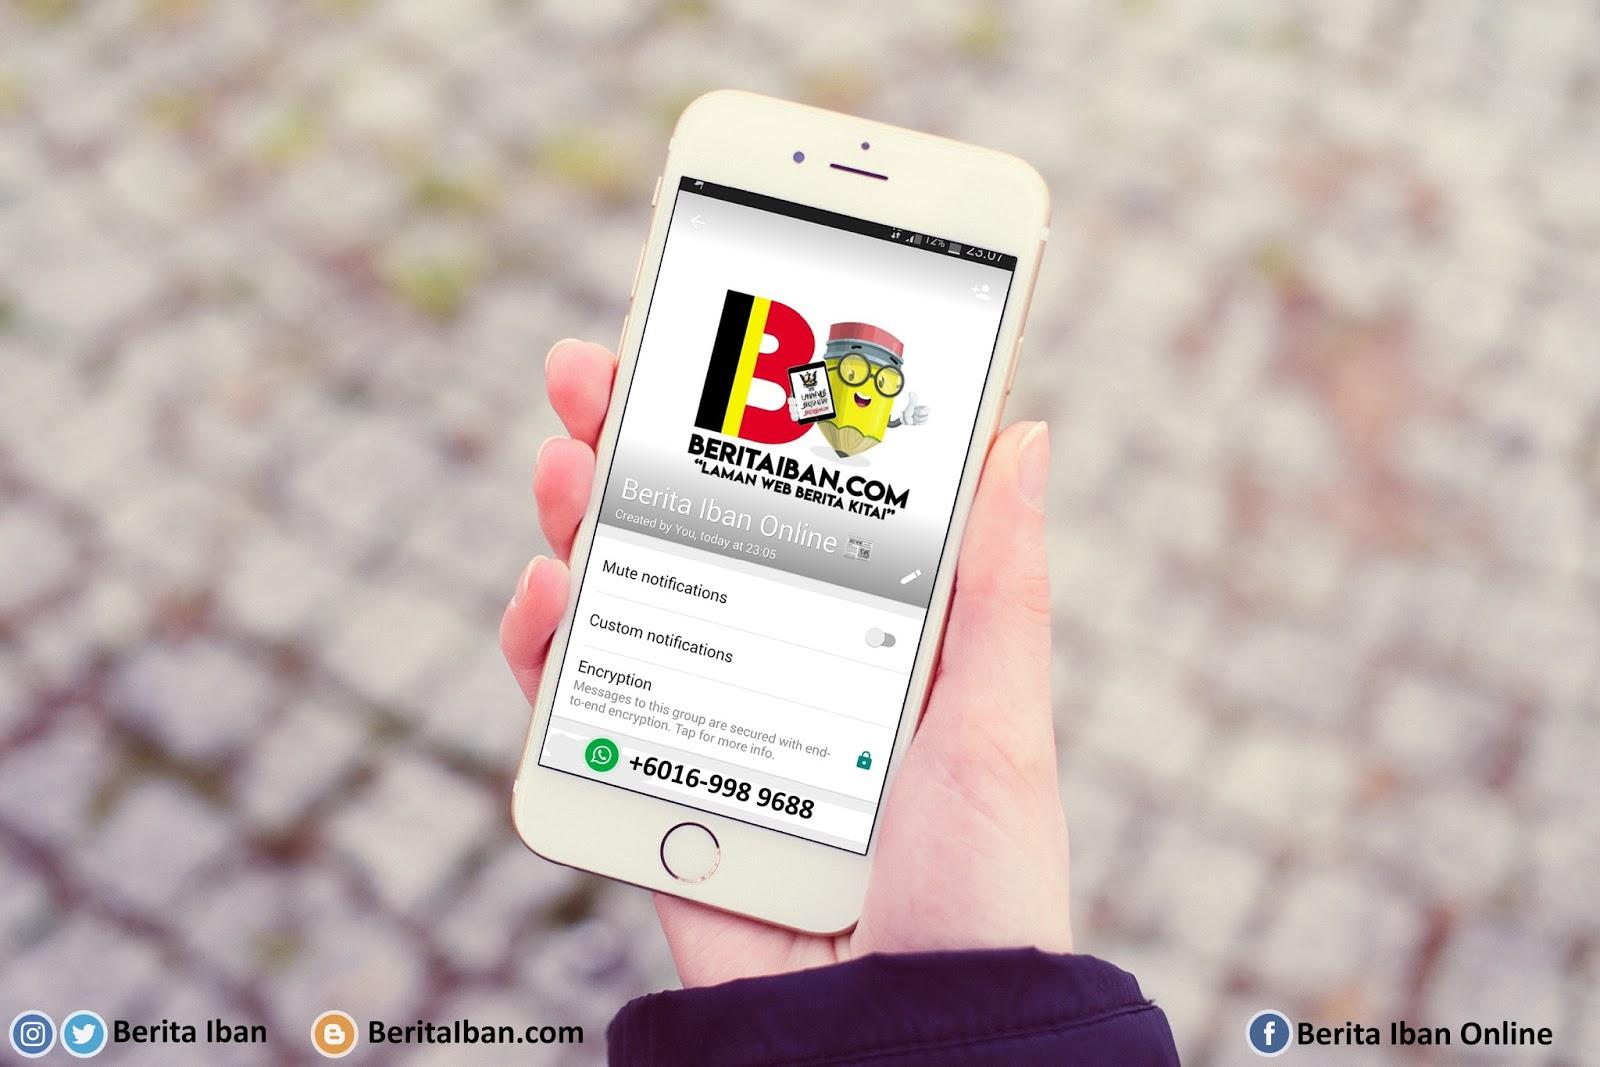 Berita Iban Online WhatsApp